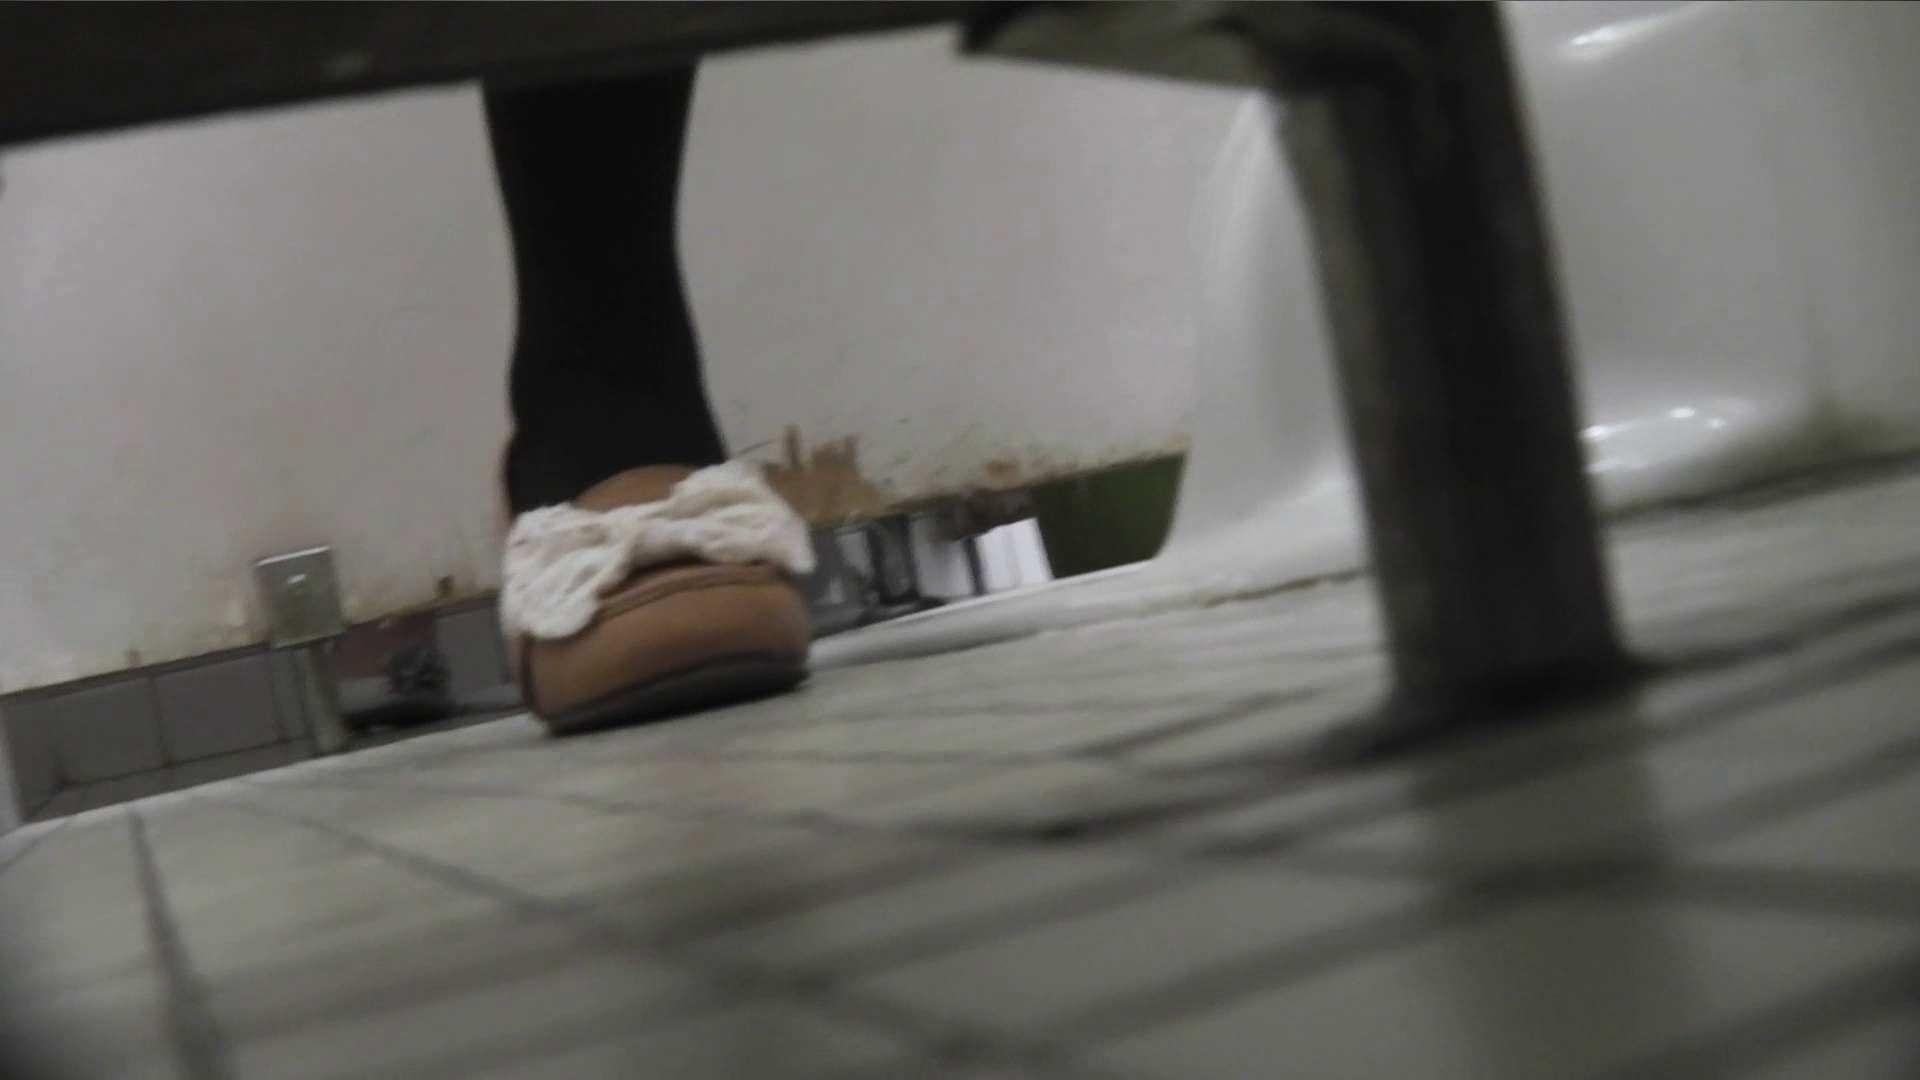 vol.06 命がけ潜伏洗面所! 茶髪タン、ハァハァ 前編 プライベート 覗きワレメ動画紹介 64画像 39